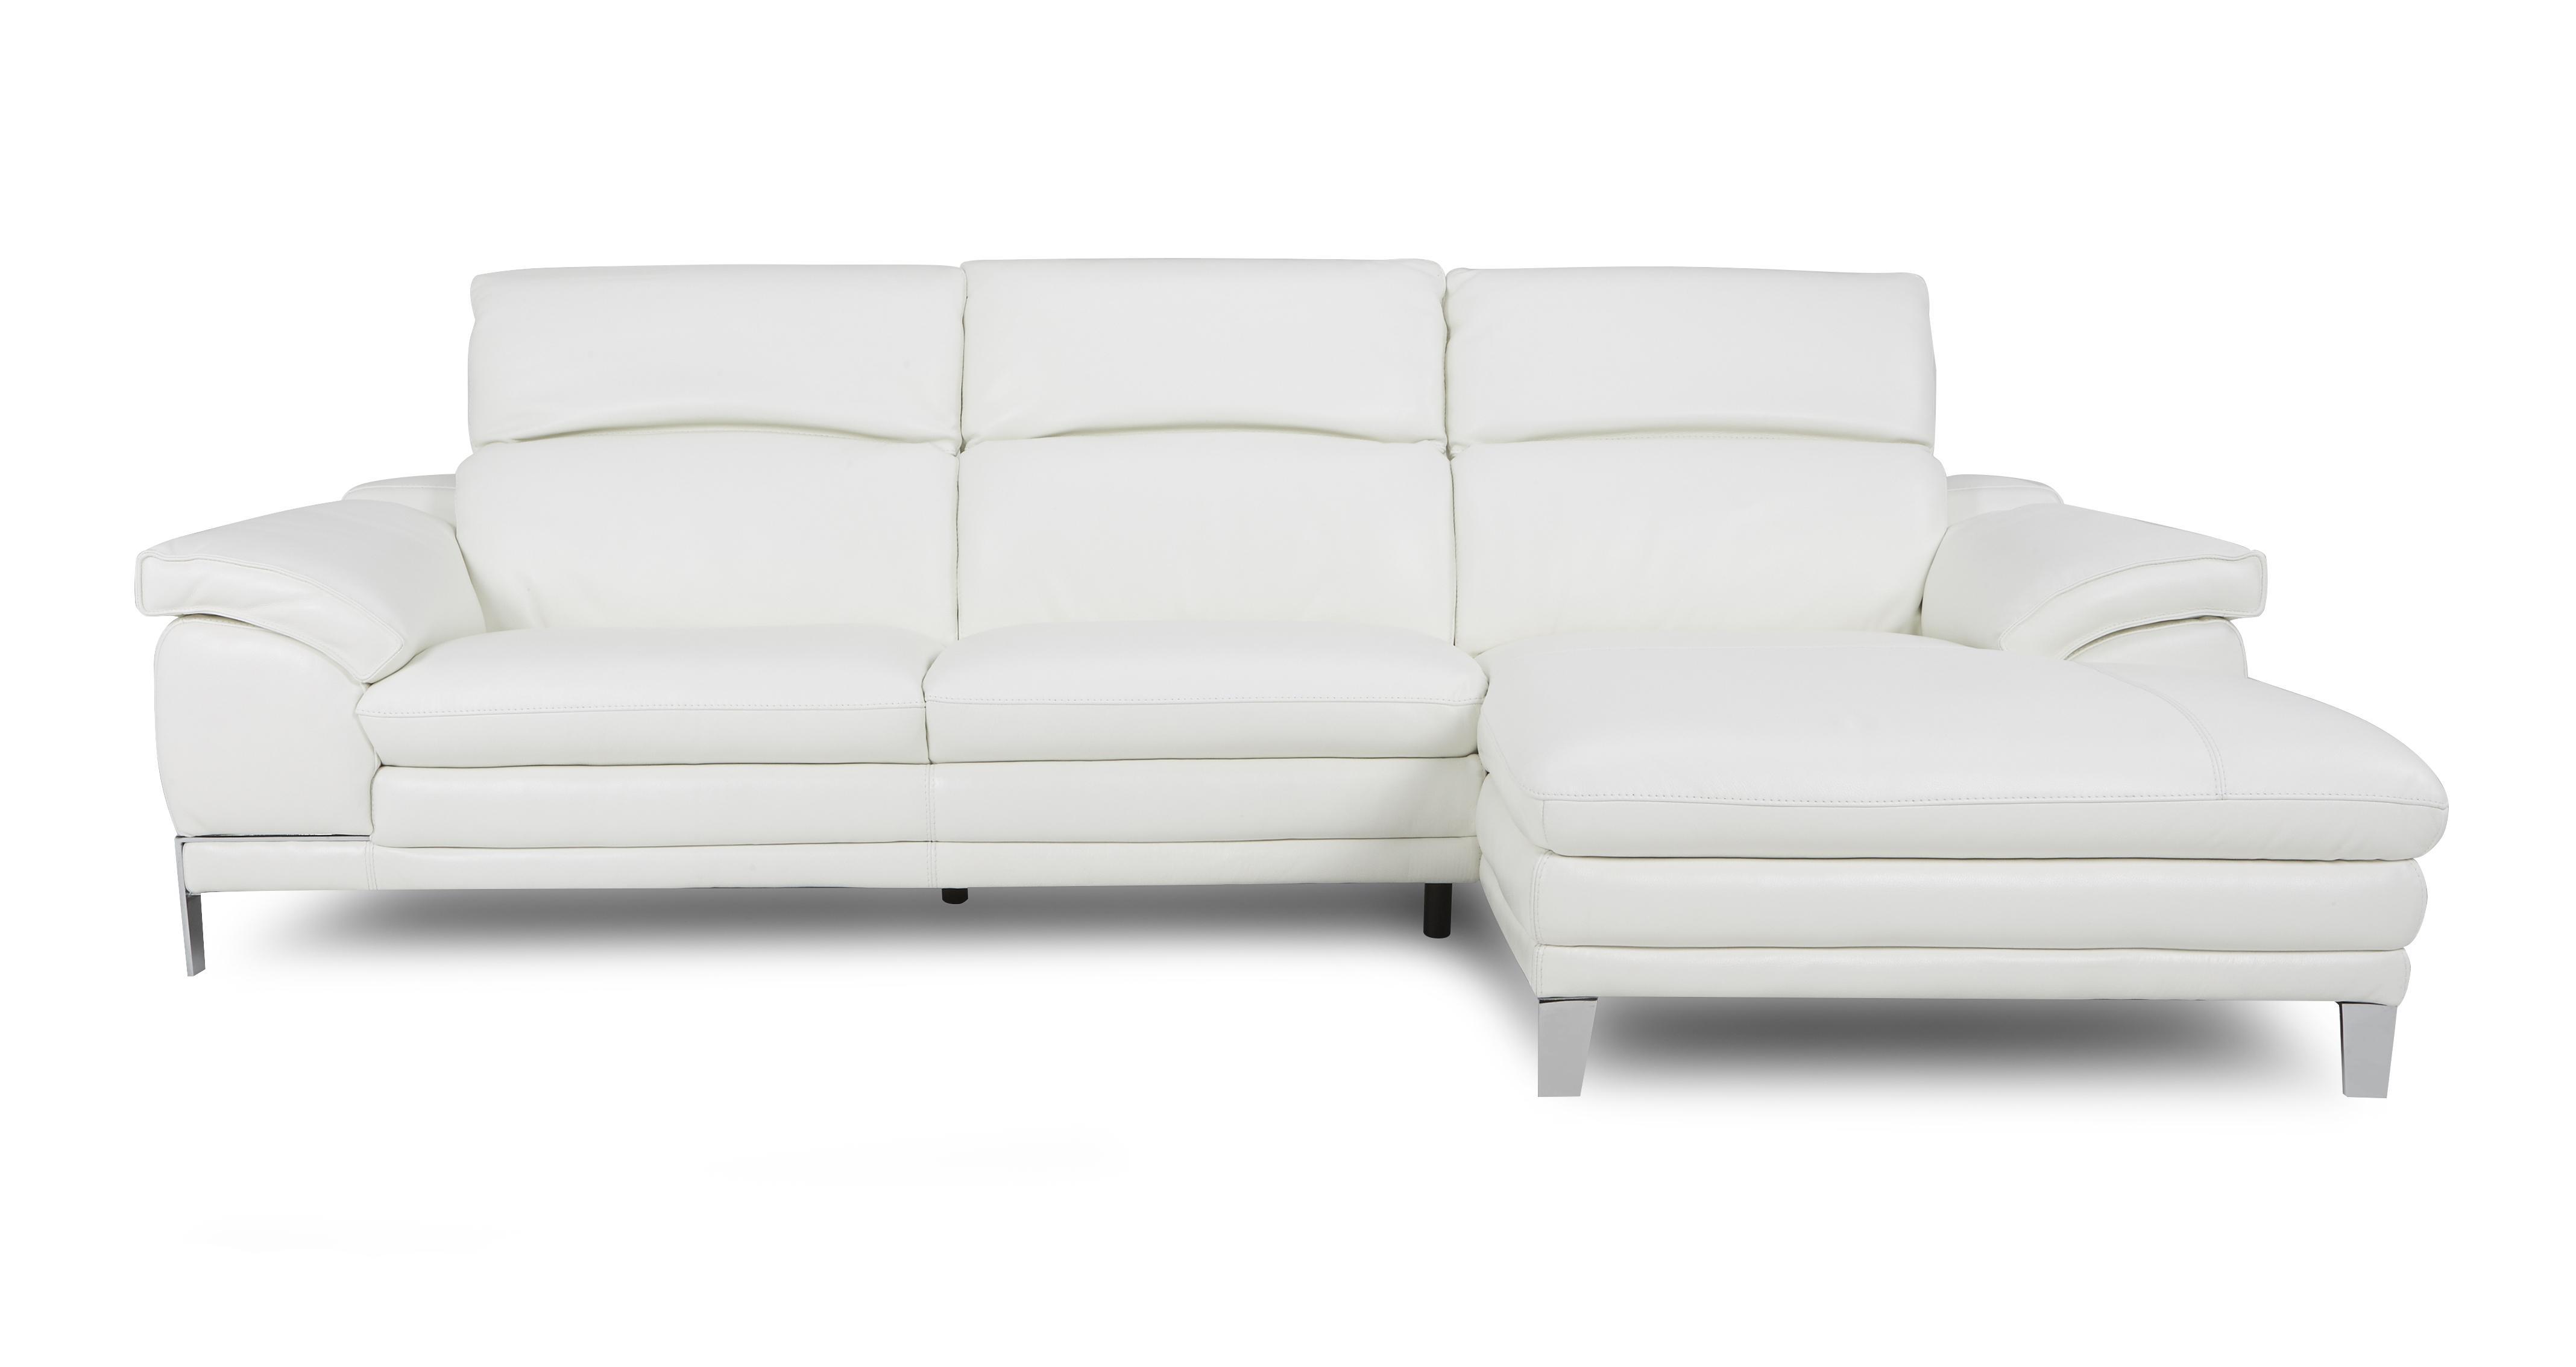 sofa company nl standard dimensions 3 seater corso optie a grote bank met recht eenzijdige chaise new